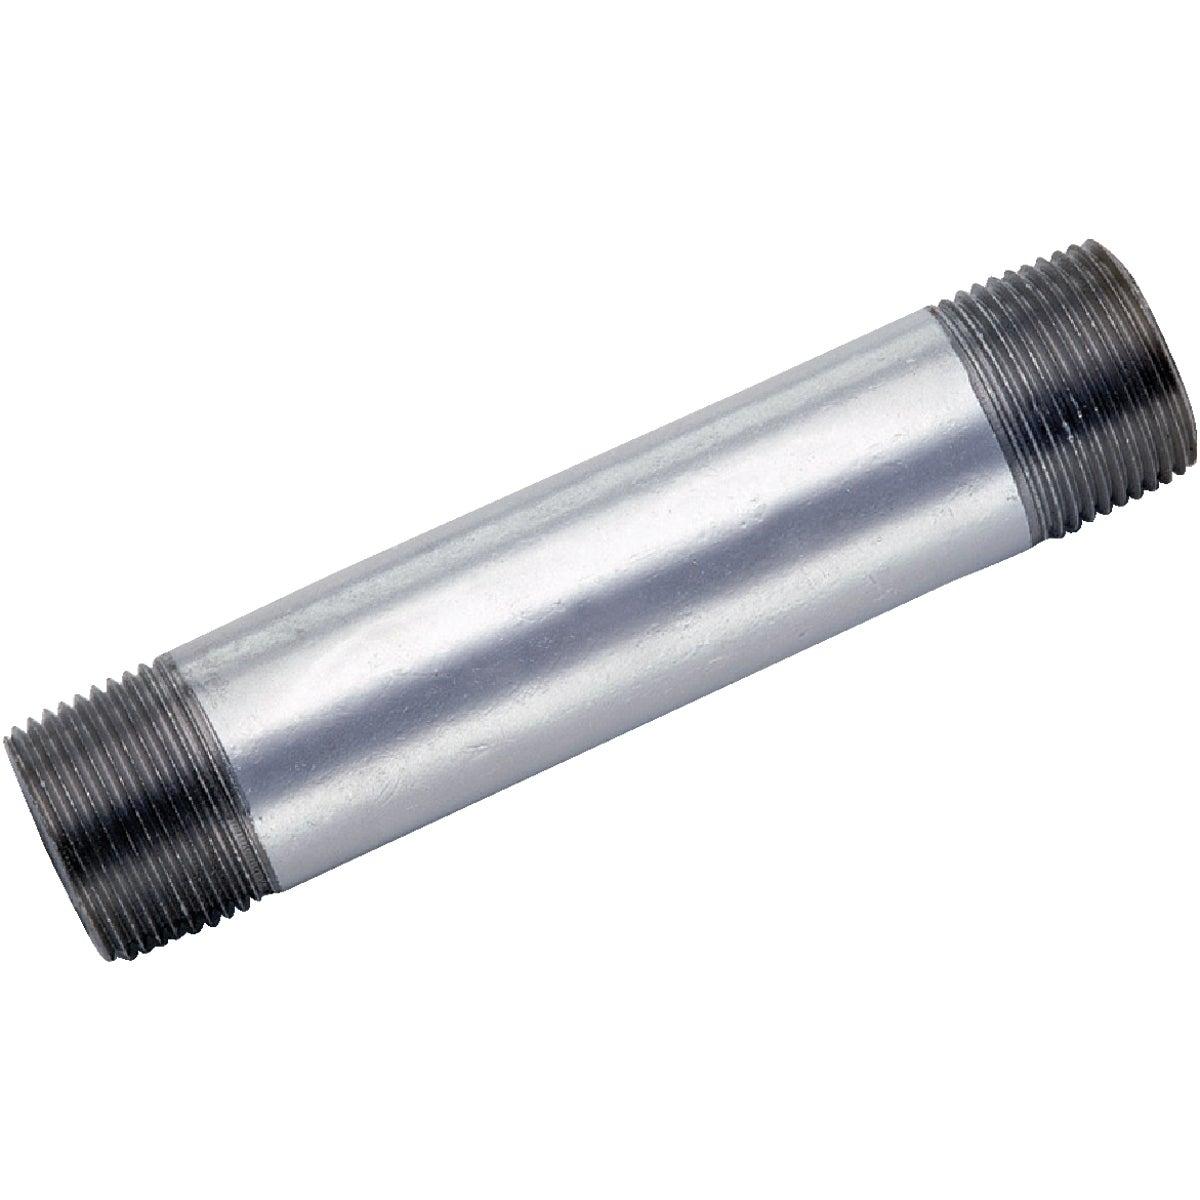 1-1/4X12 GALV NIPPLE - 8700153508 by Anvil International